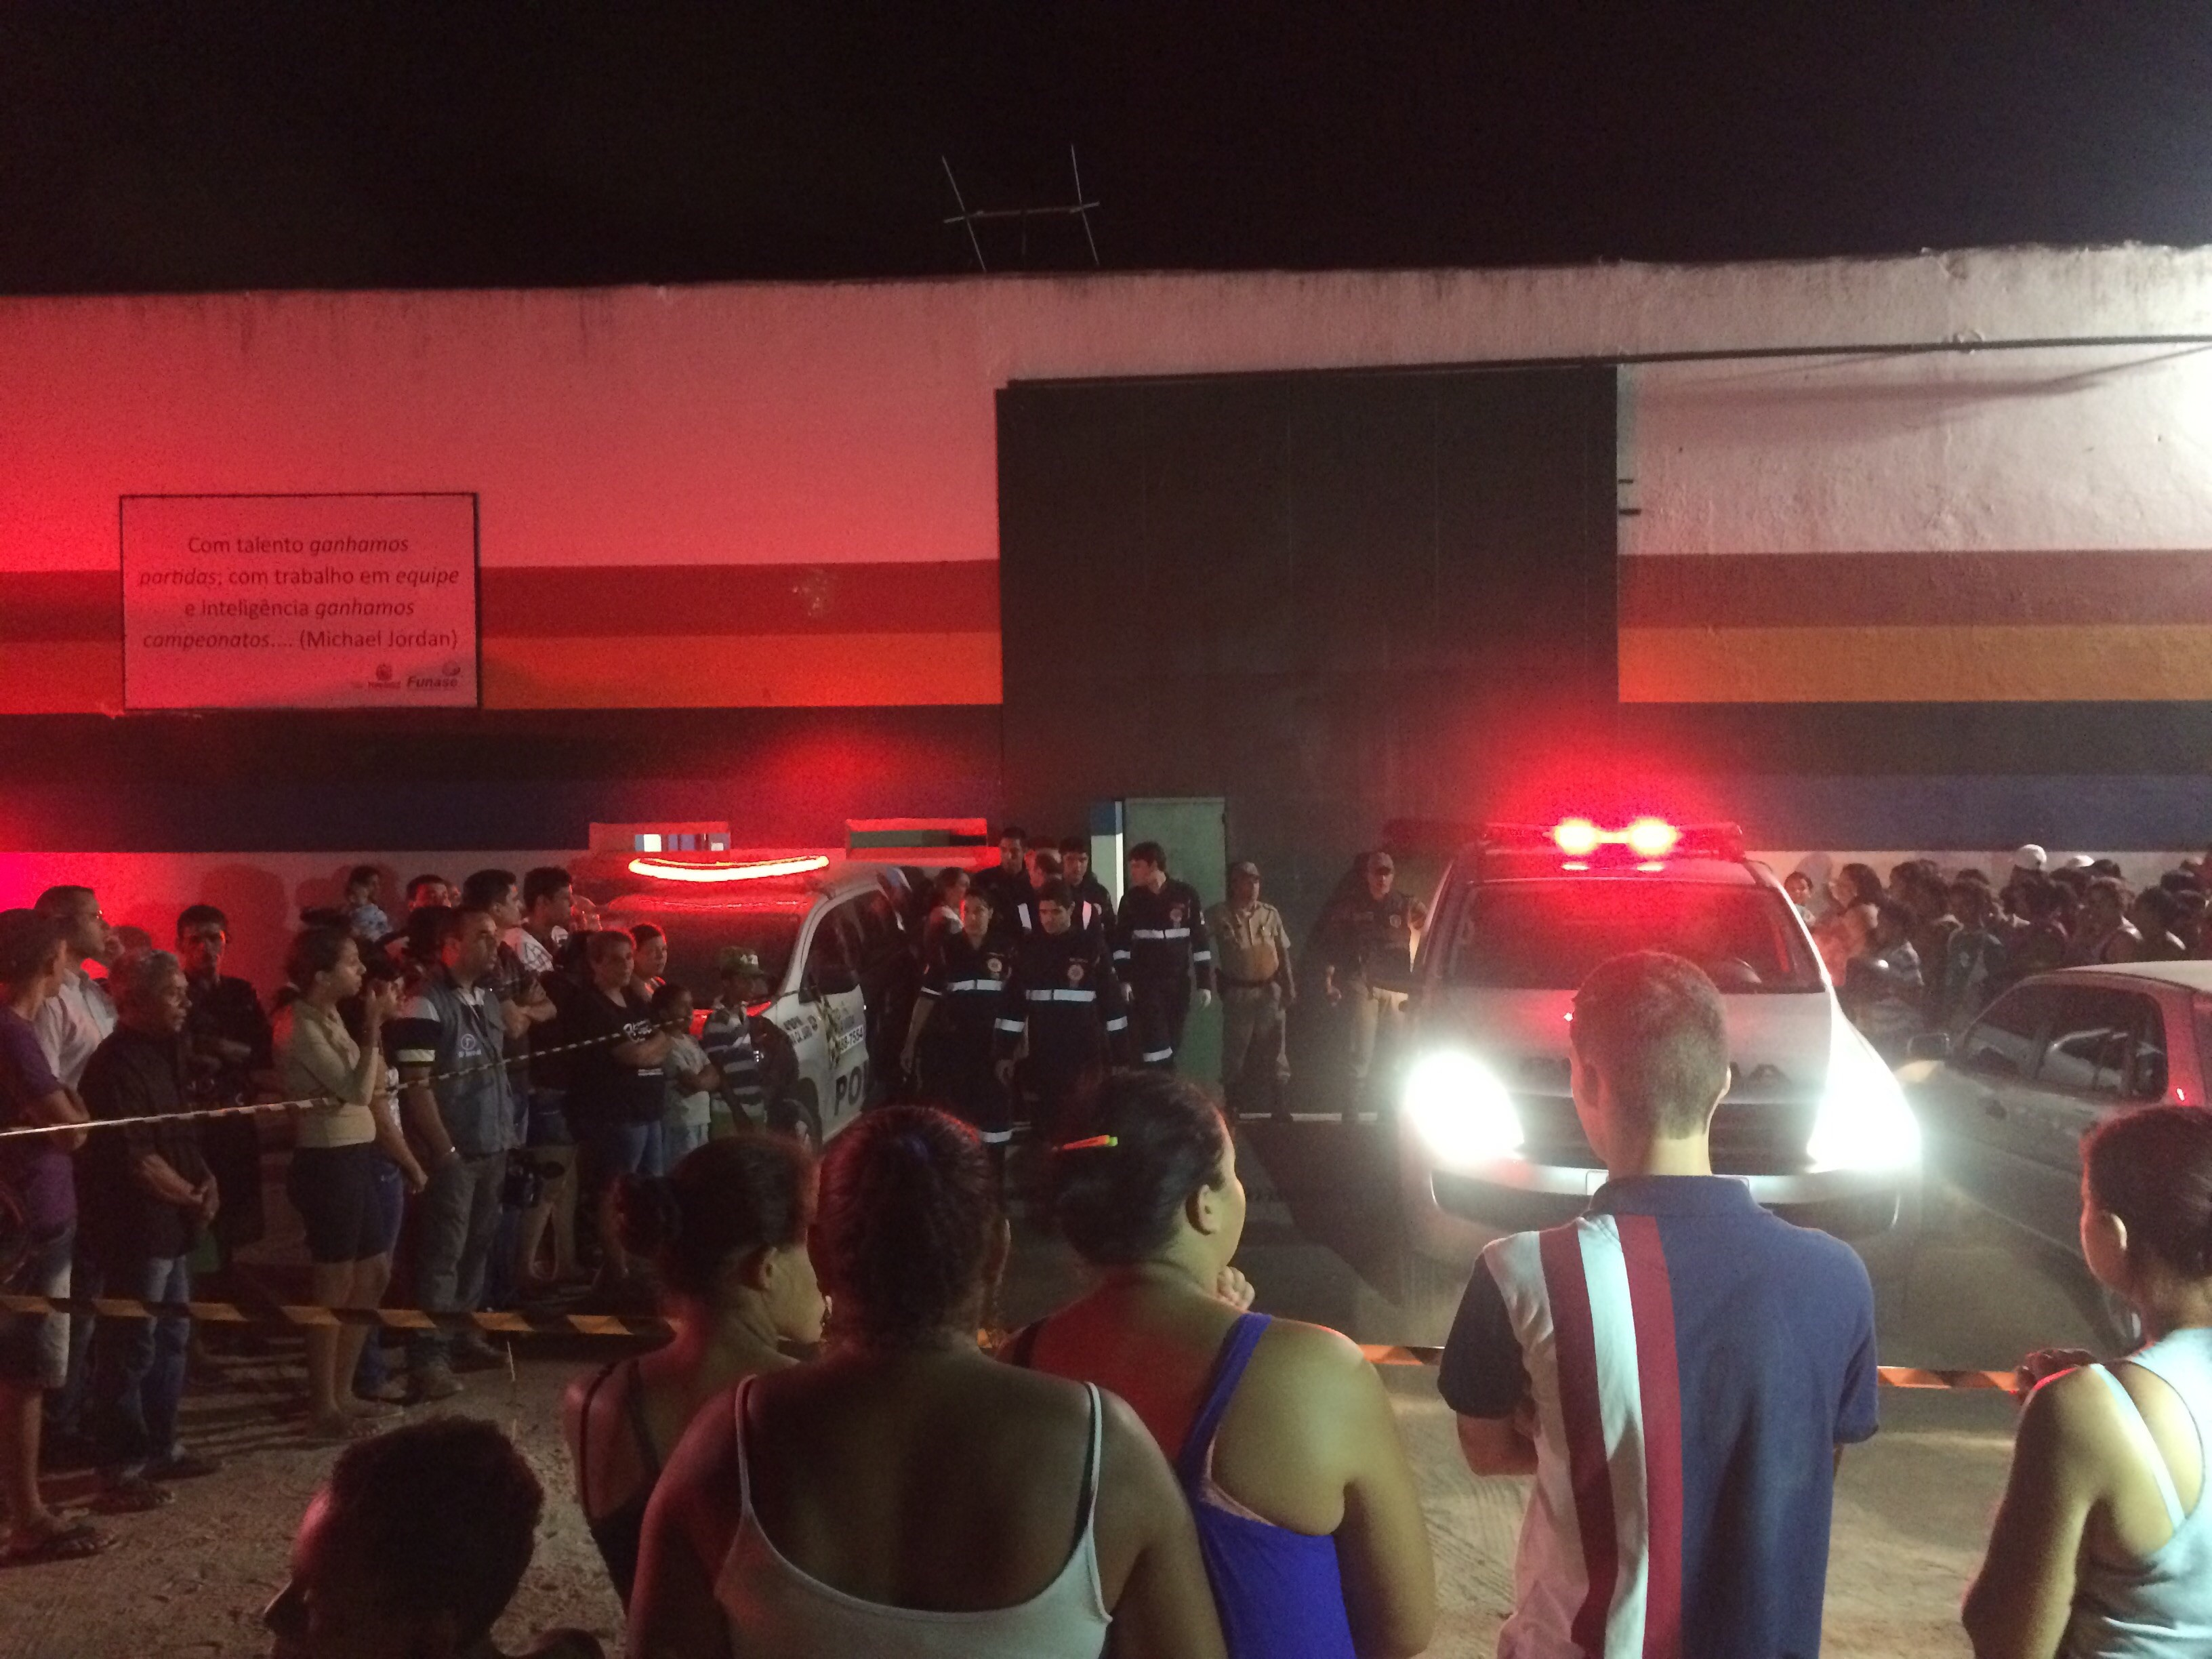 Rebelião na unidade da Funase em Caruaru, Pernambuco (Foto: Magno Wendel/ TV Asa Branca)